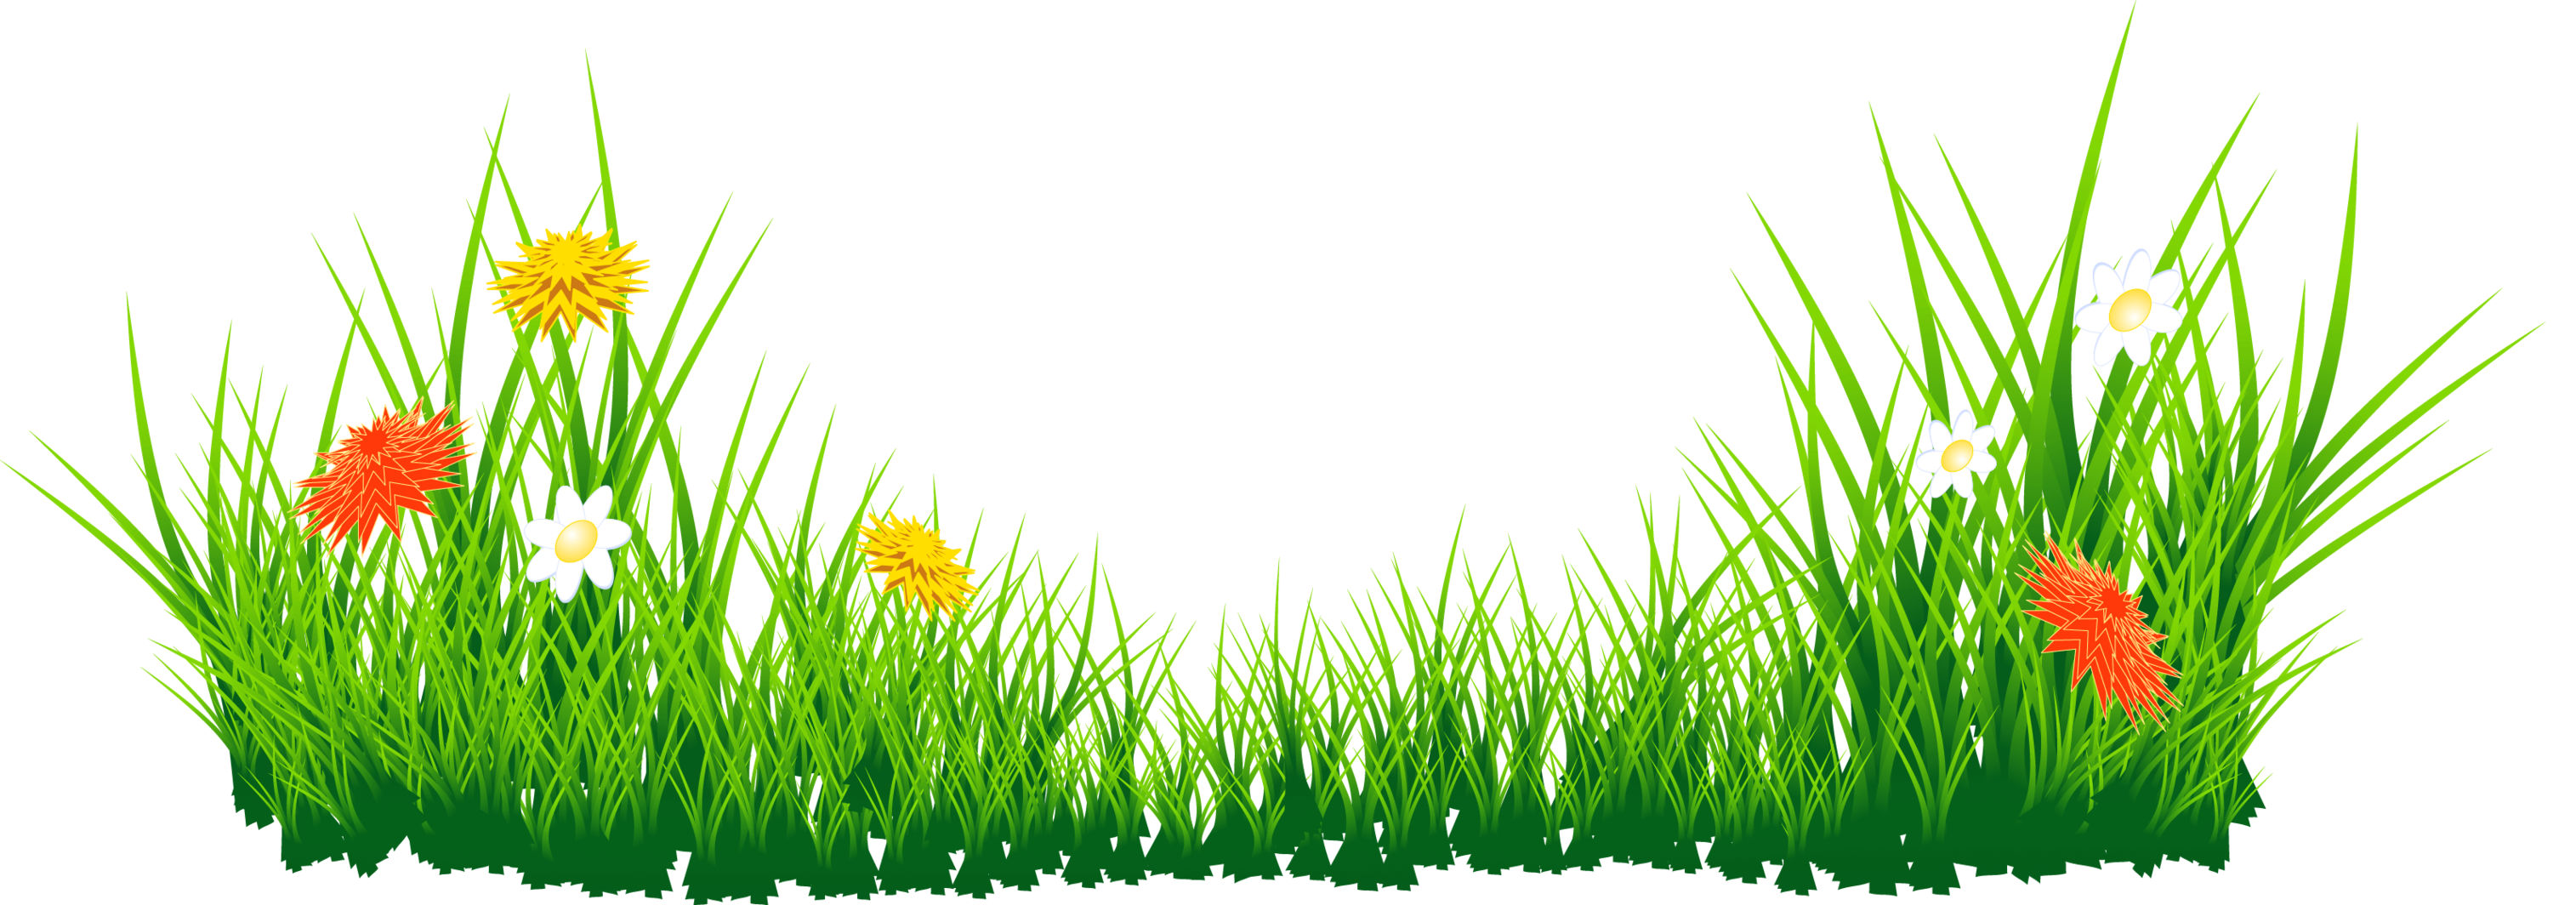 Grass border. Clipart free download best